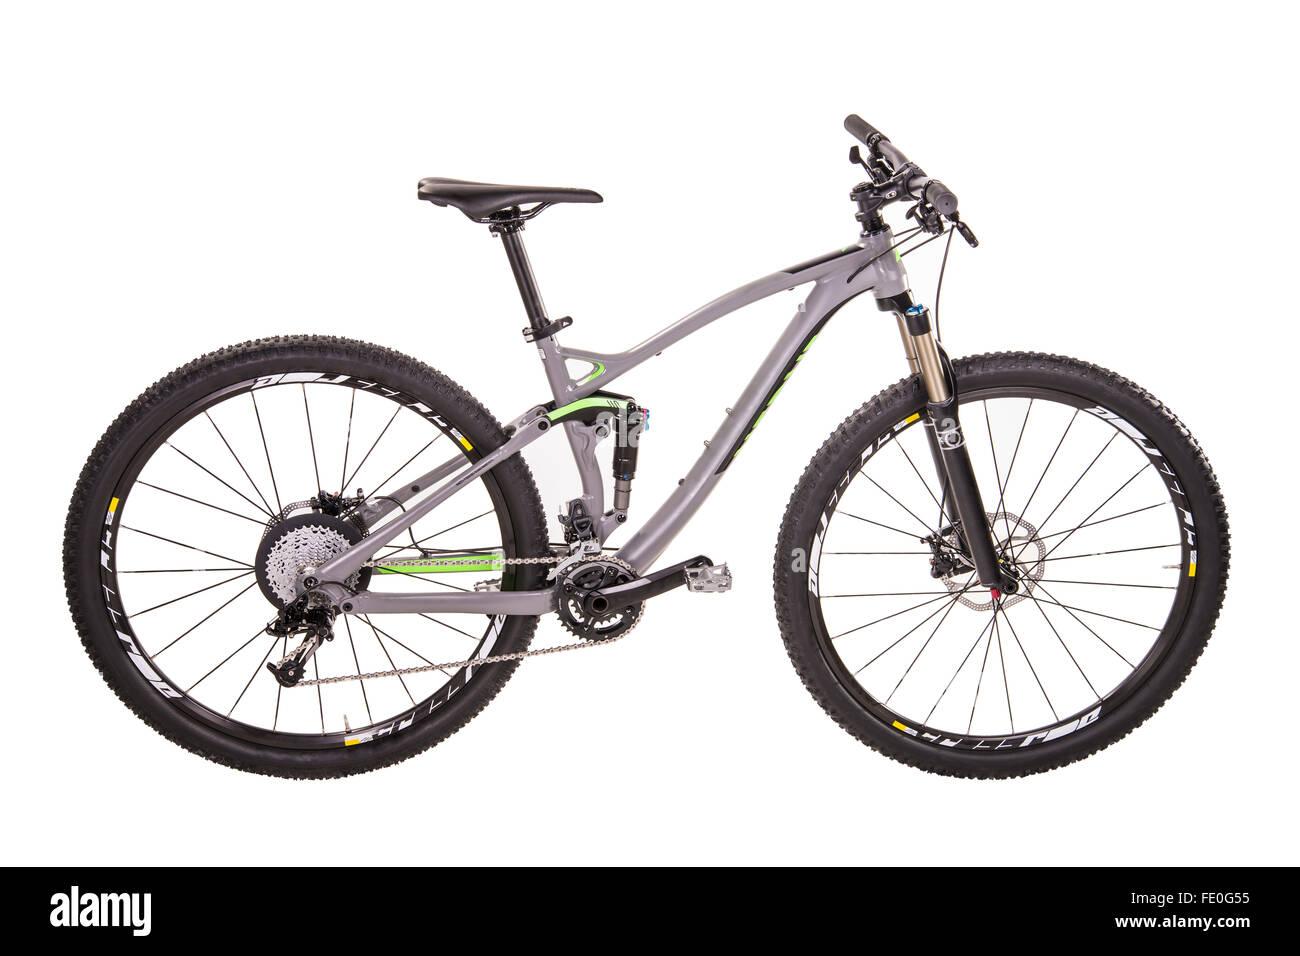 Modern mountain bike - Stock Image